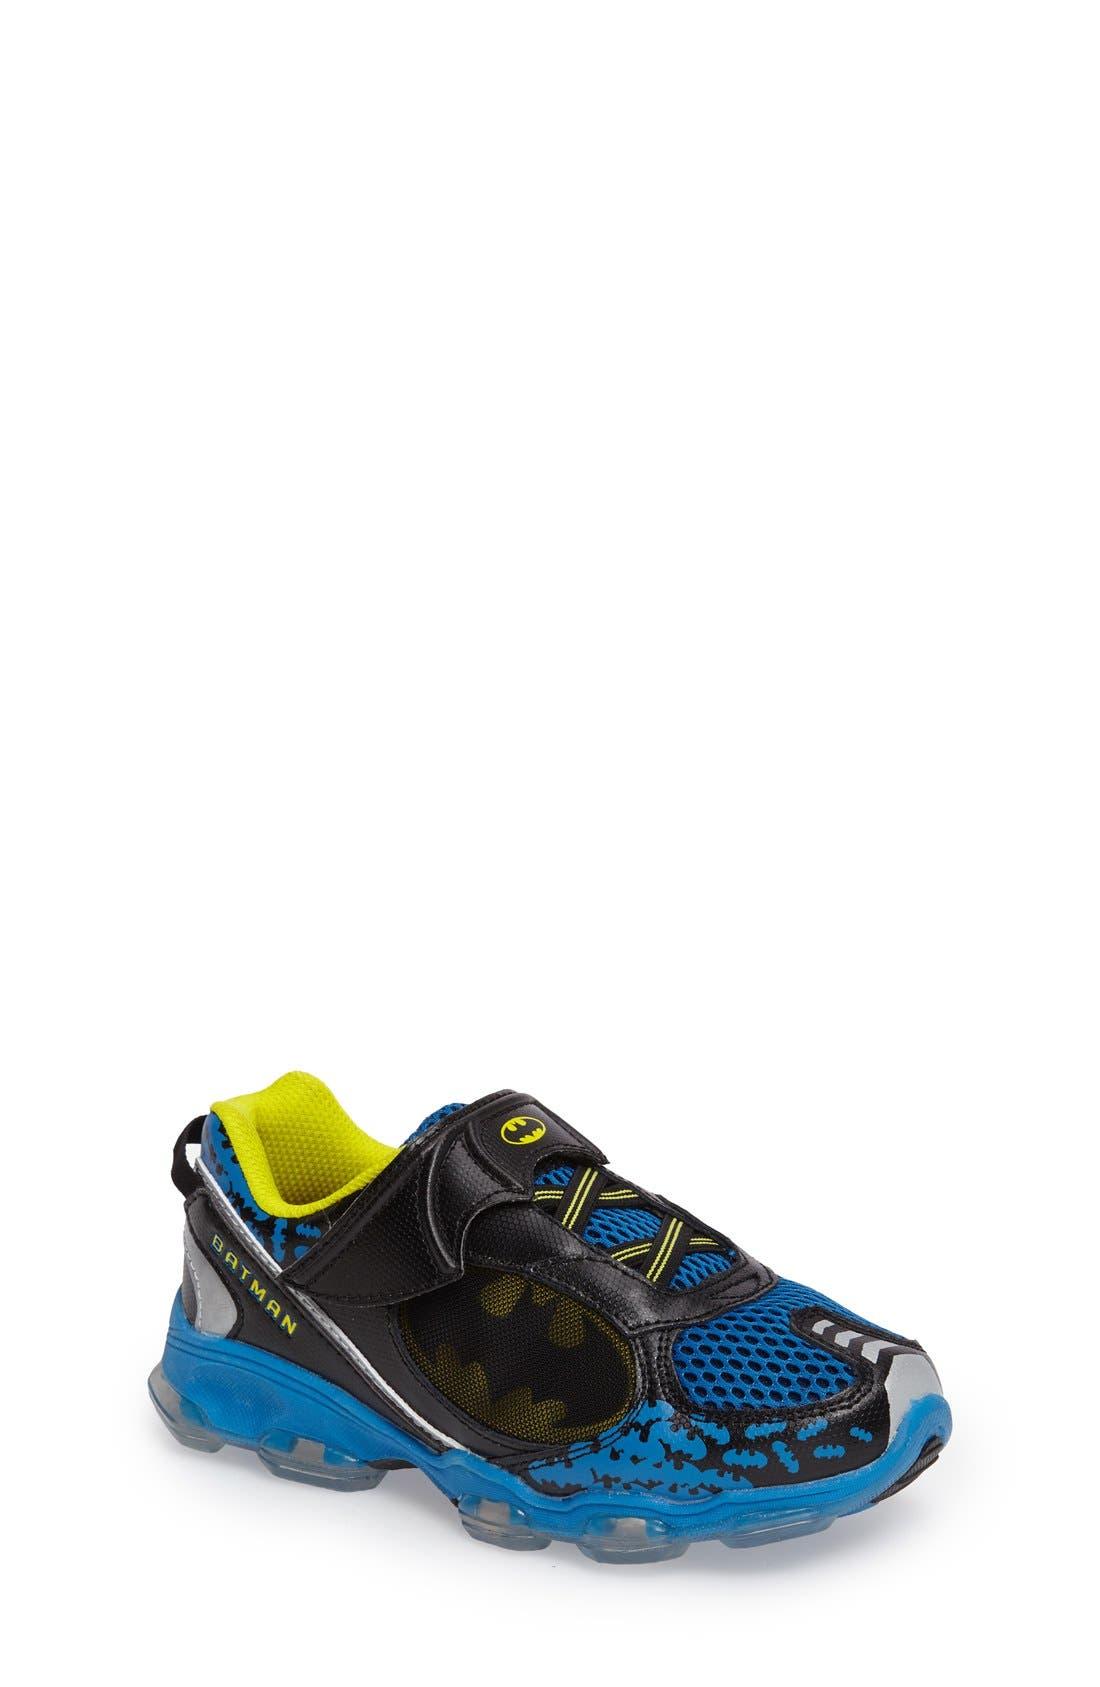 Main Image - Stride Rite Batman™ Light-Up Sneaker (Walker, Toddler & Little Kid)